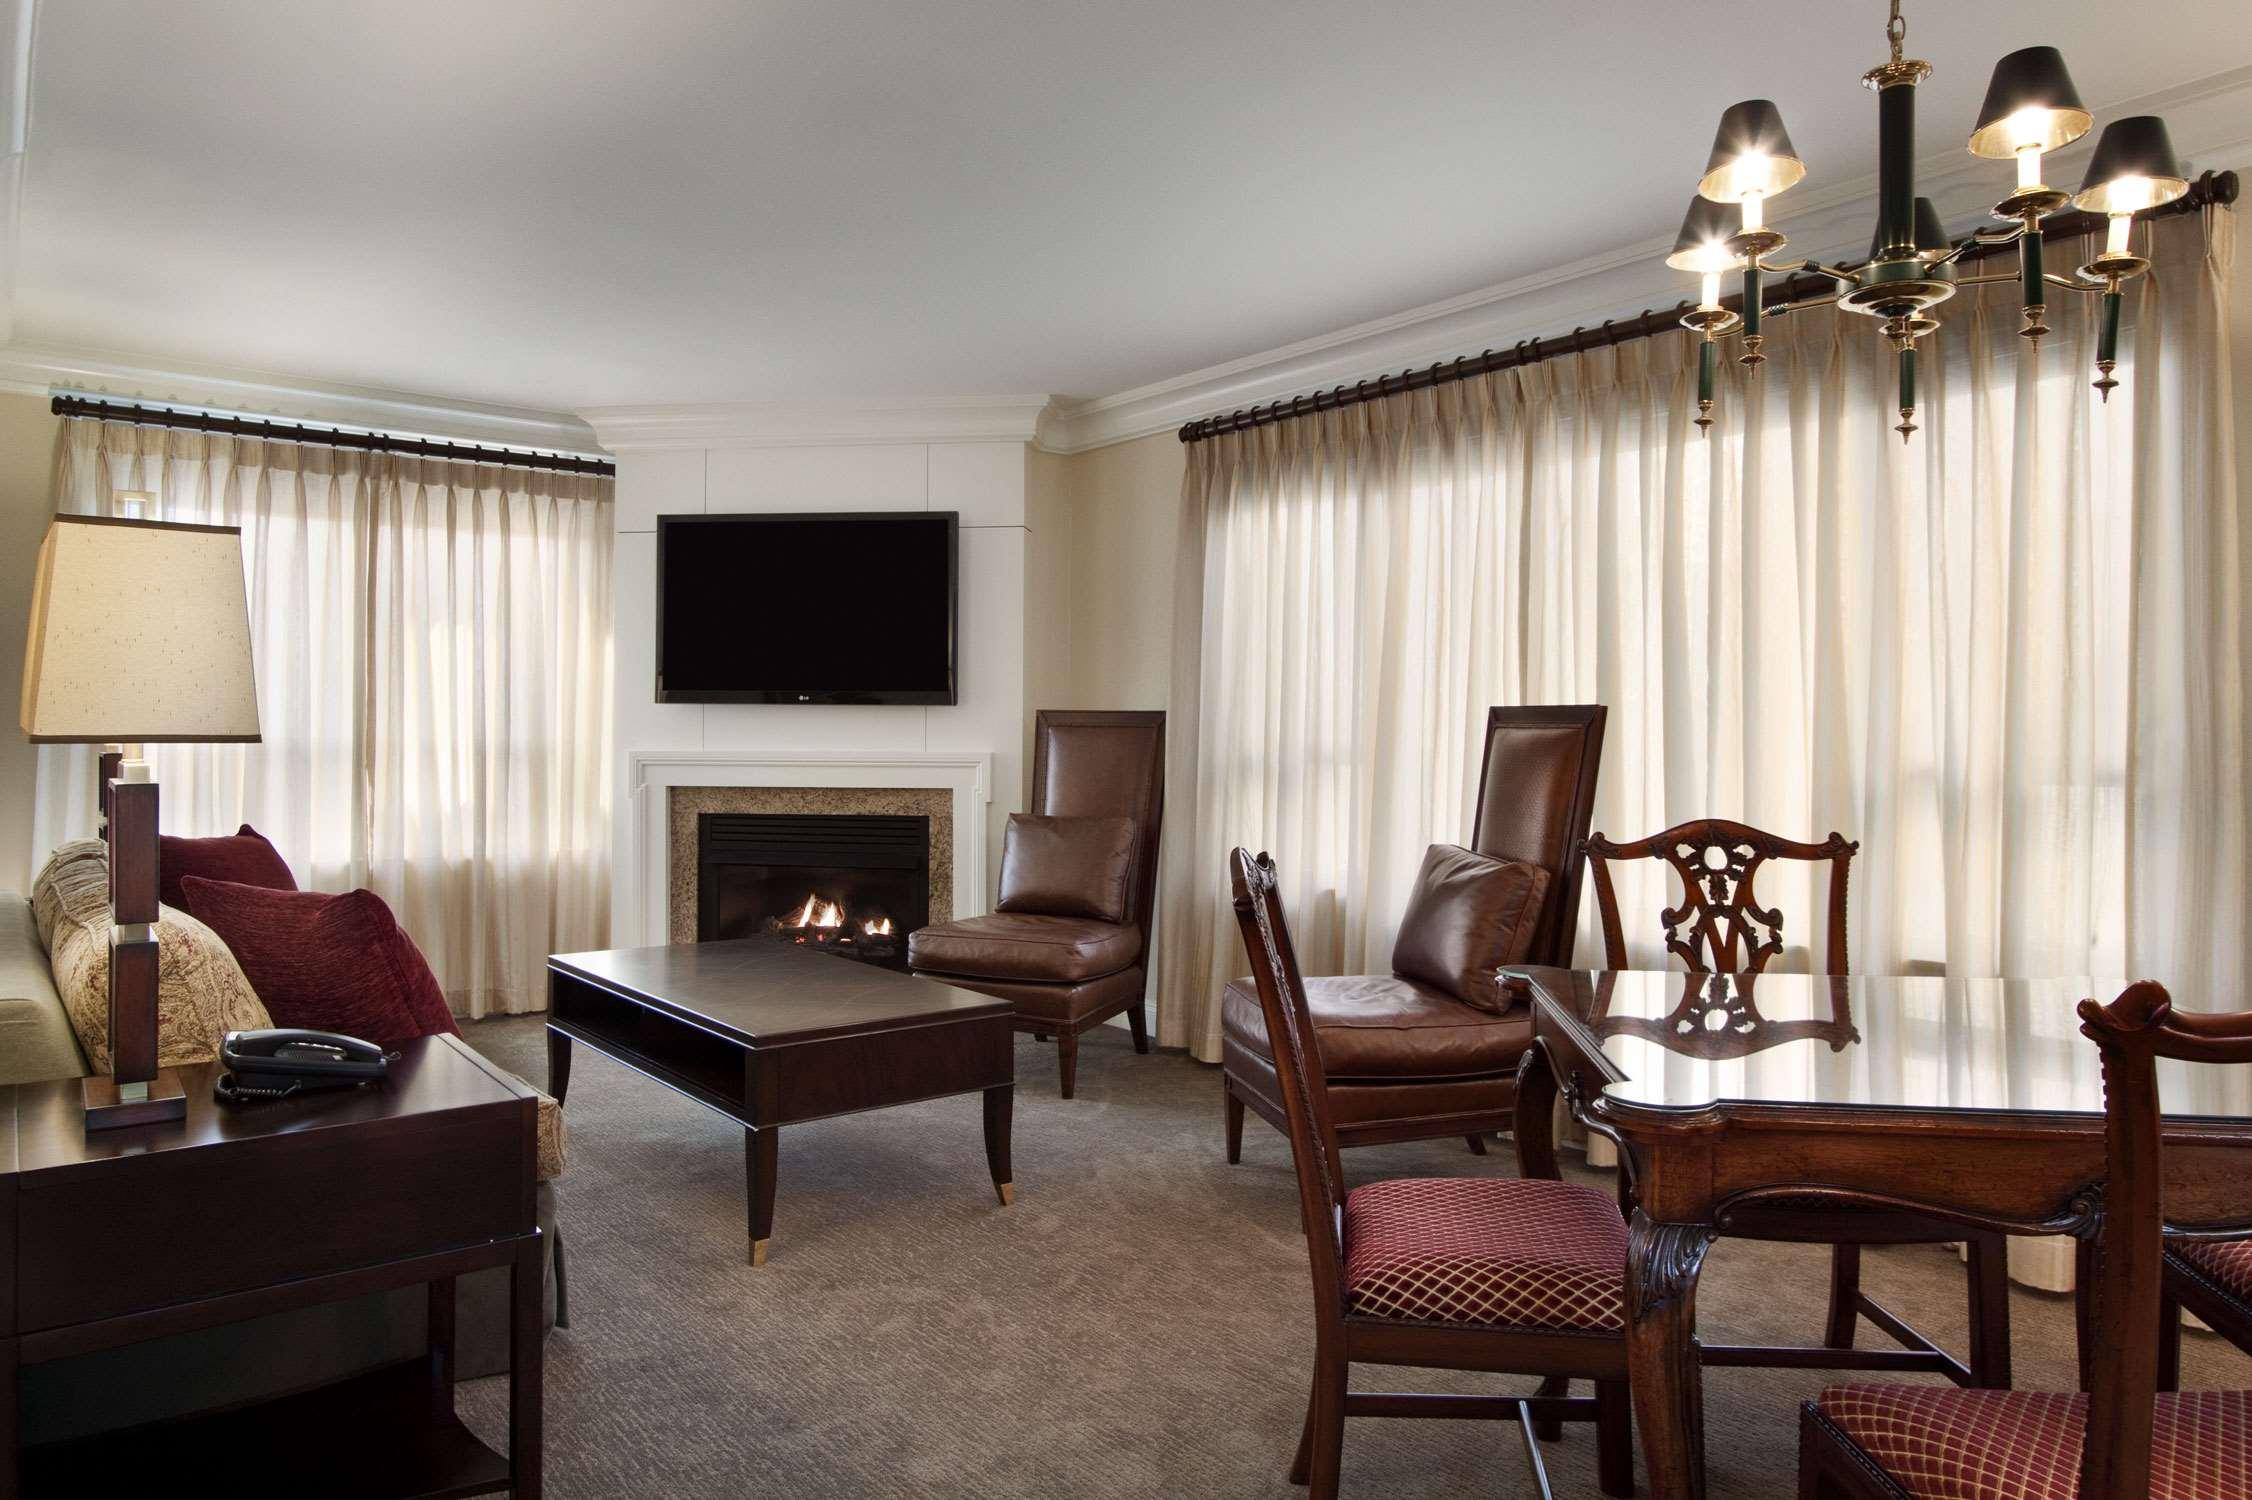 Embassy Suites by Hilton Washington DC Convention Center image 20